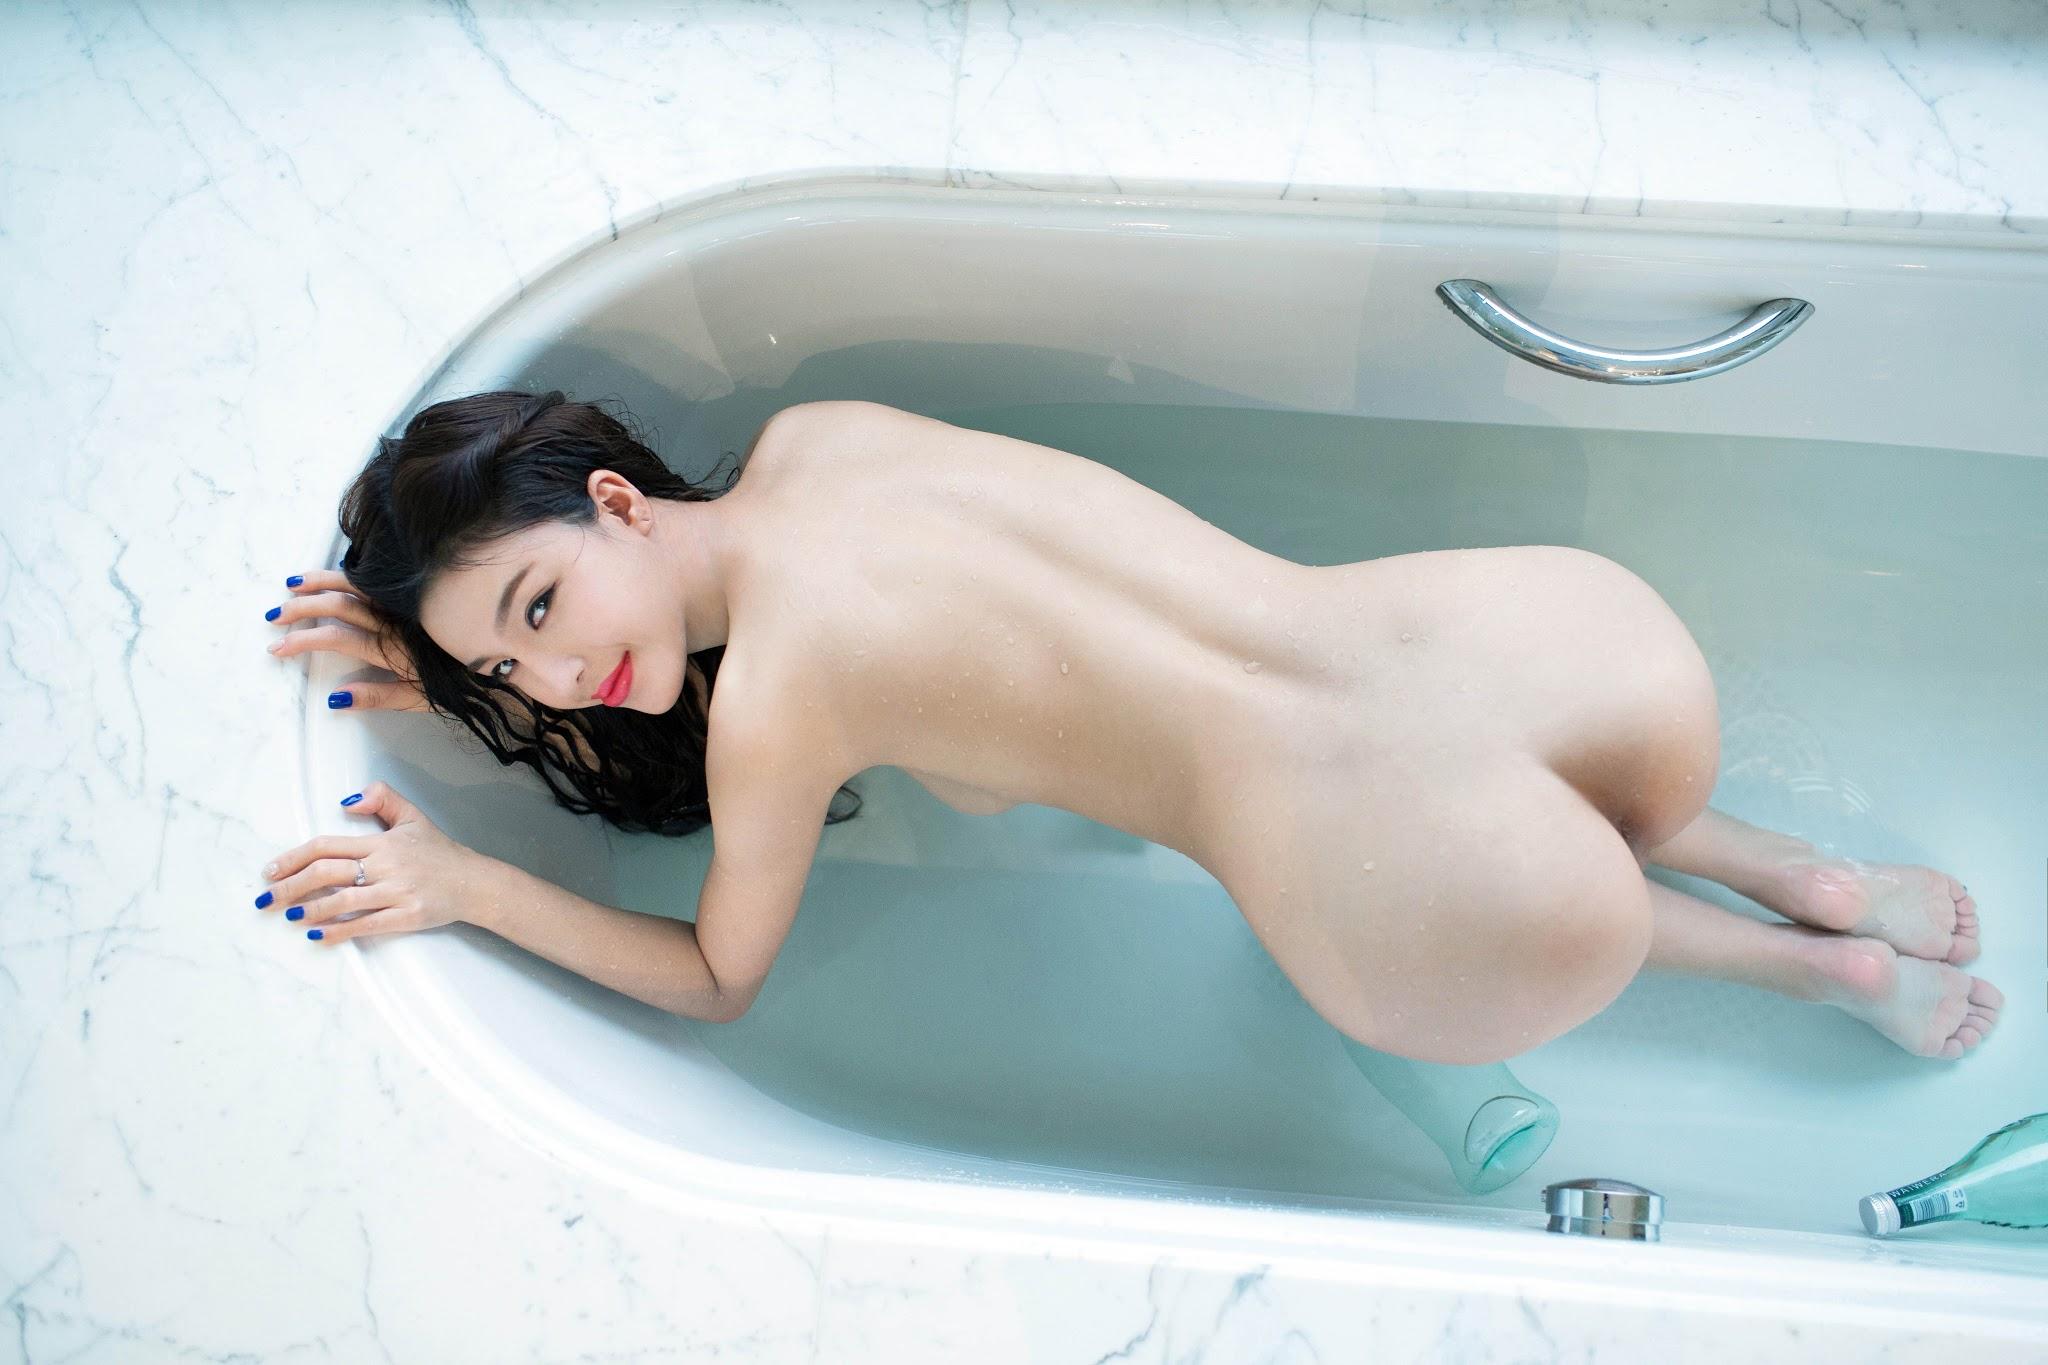 Pity, that Ru xi naked